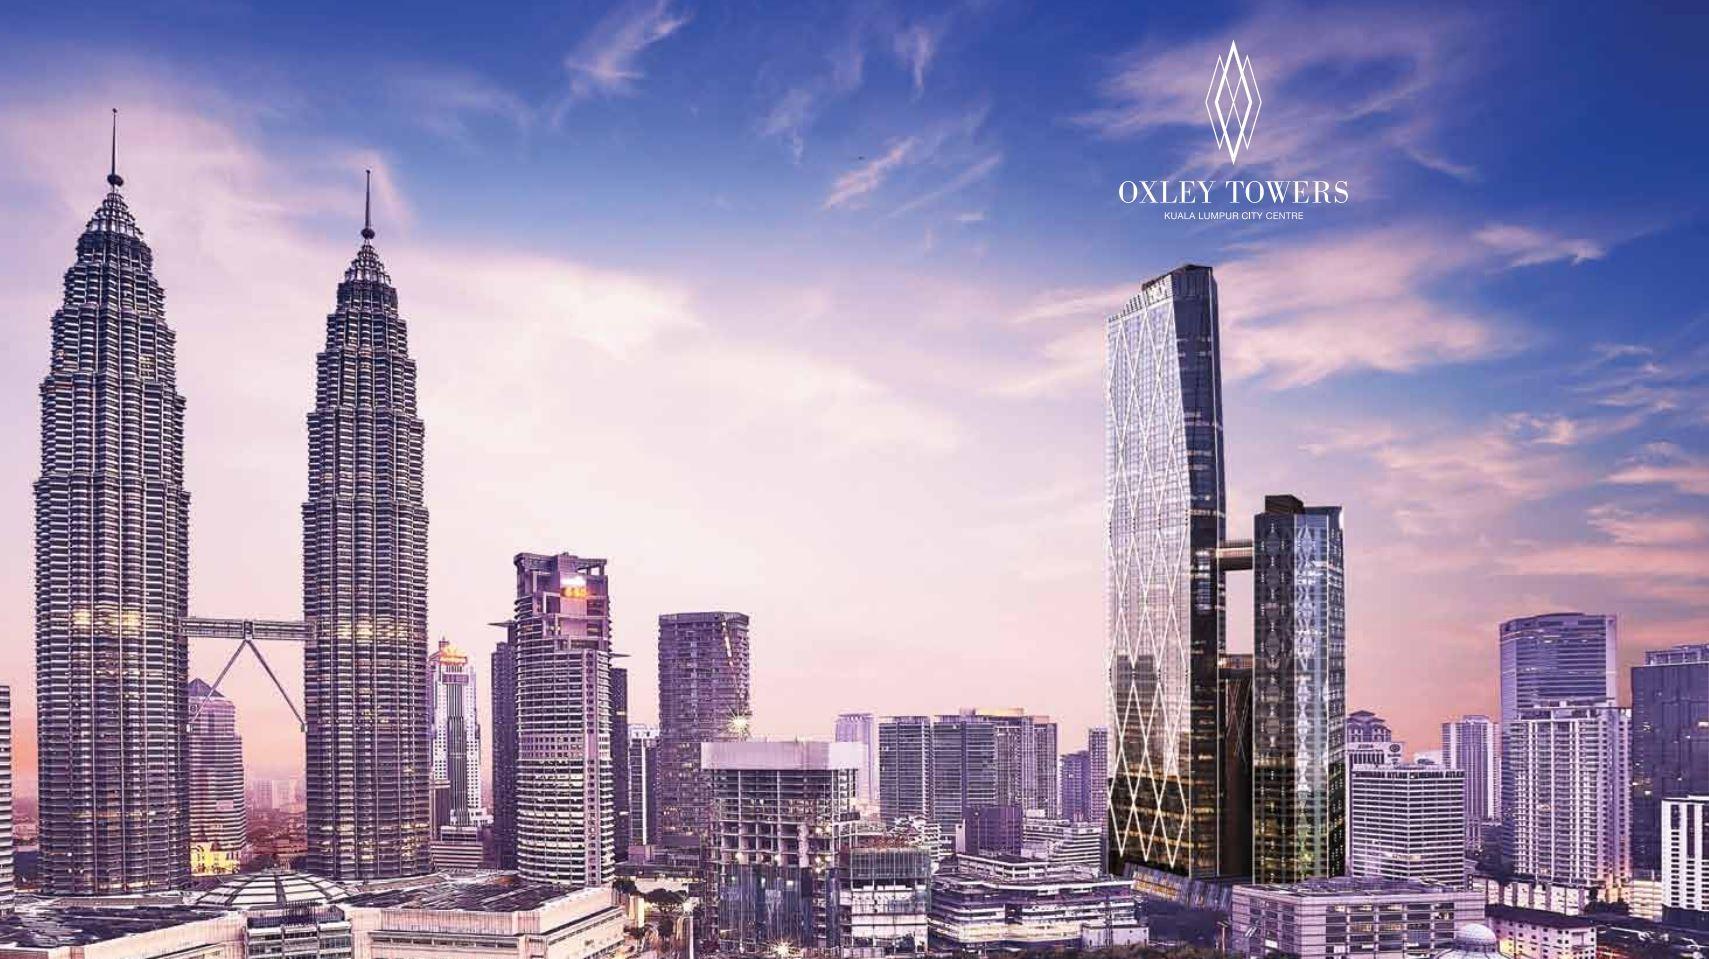 SO Sofitel Oxley Towers, Kuala Lumpur Malaysia